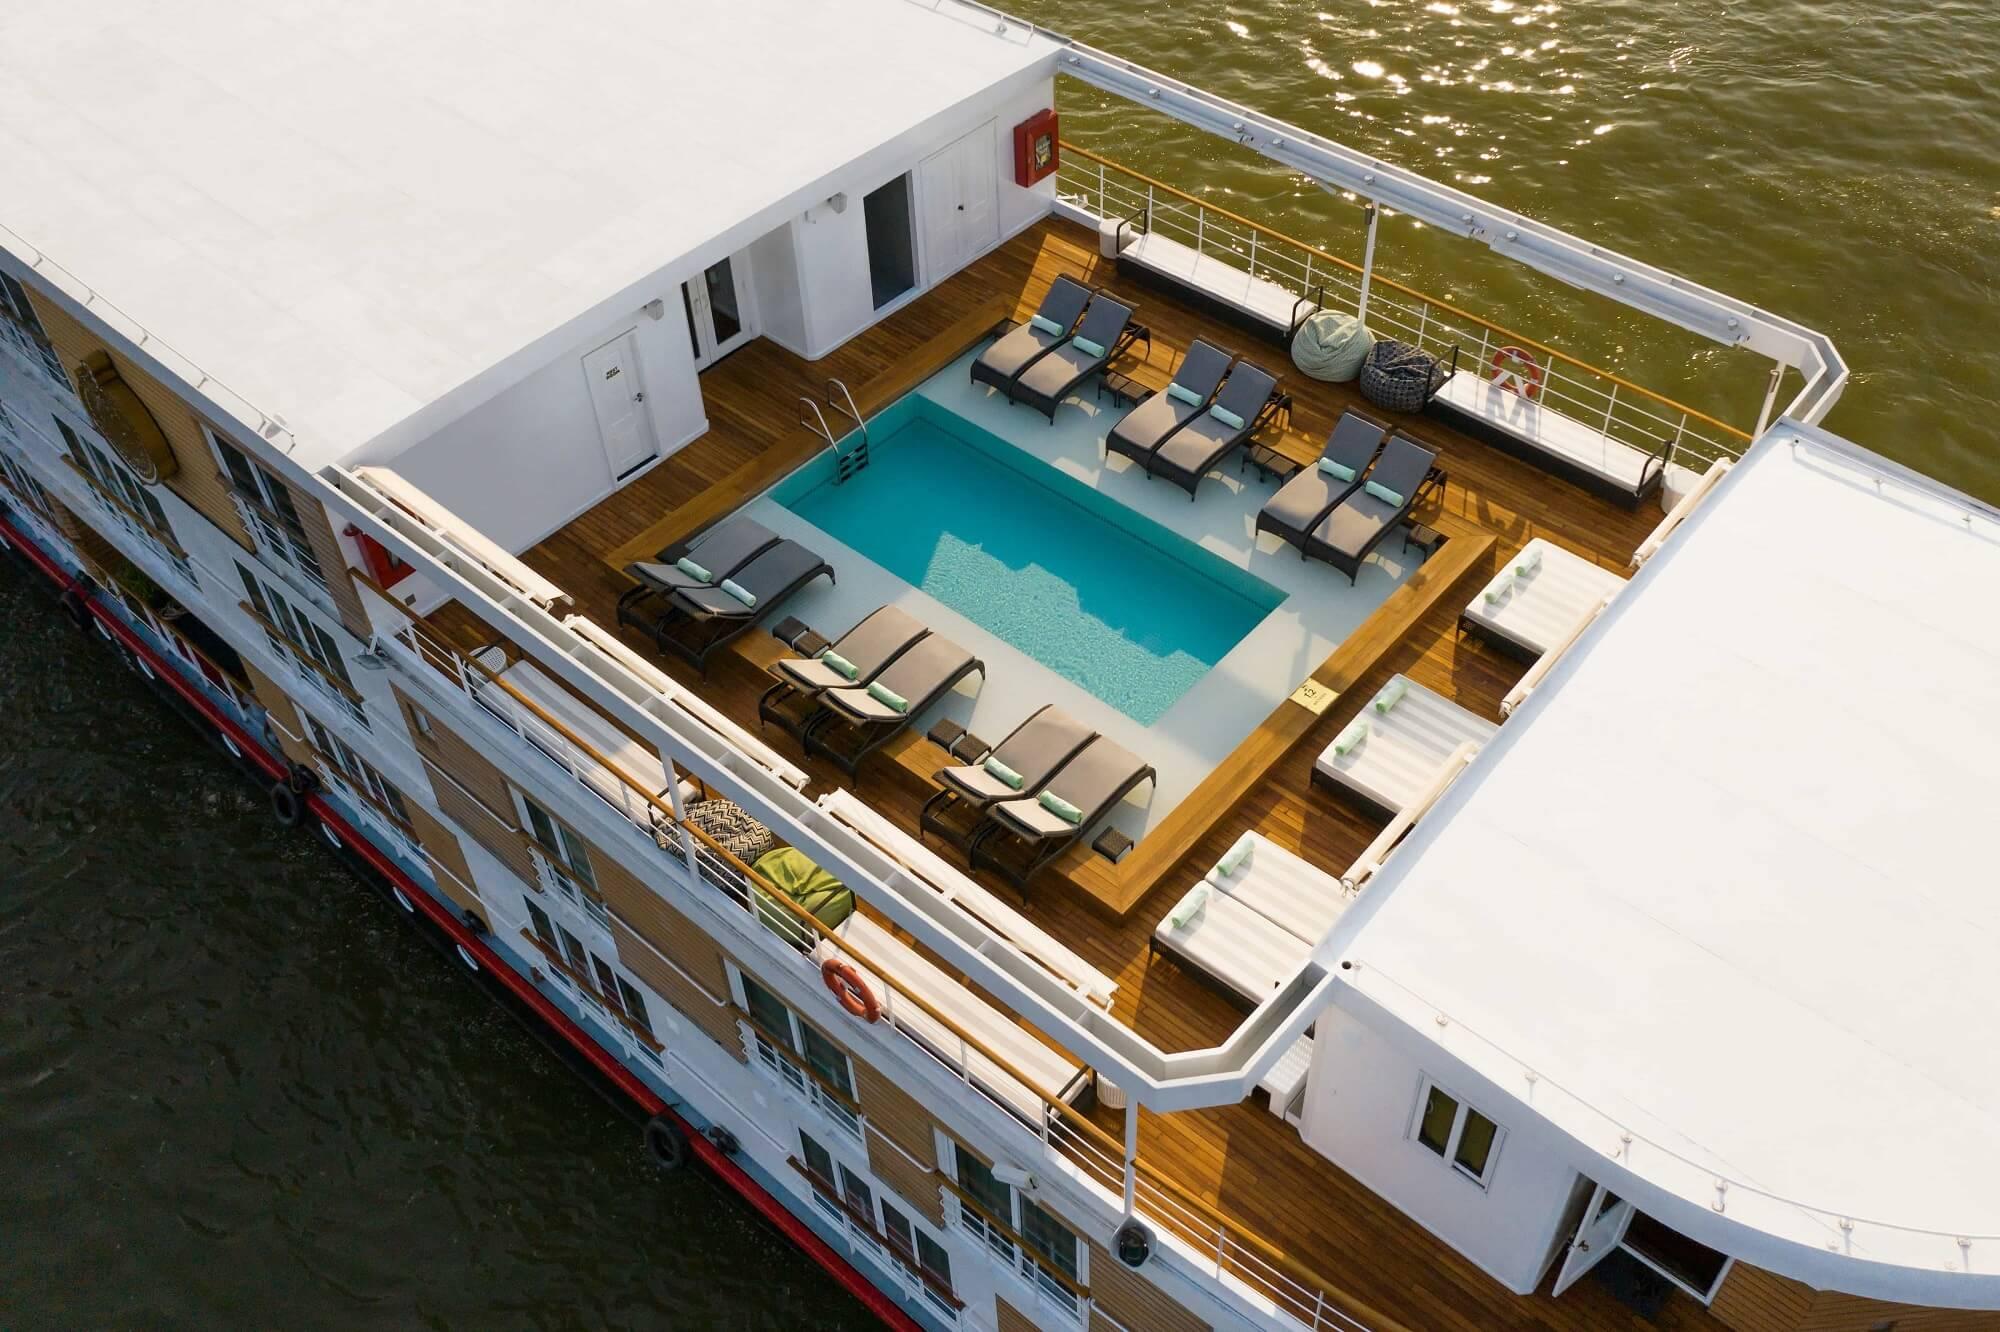 The Strand Cruises Pool